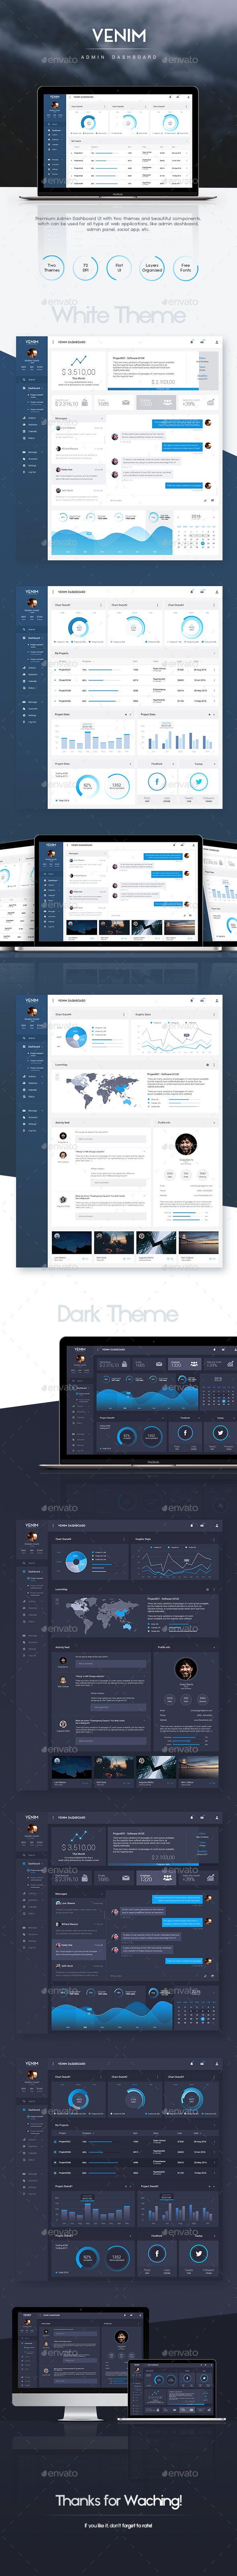 Admin Dashboard UI Template (User Interfaces)